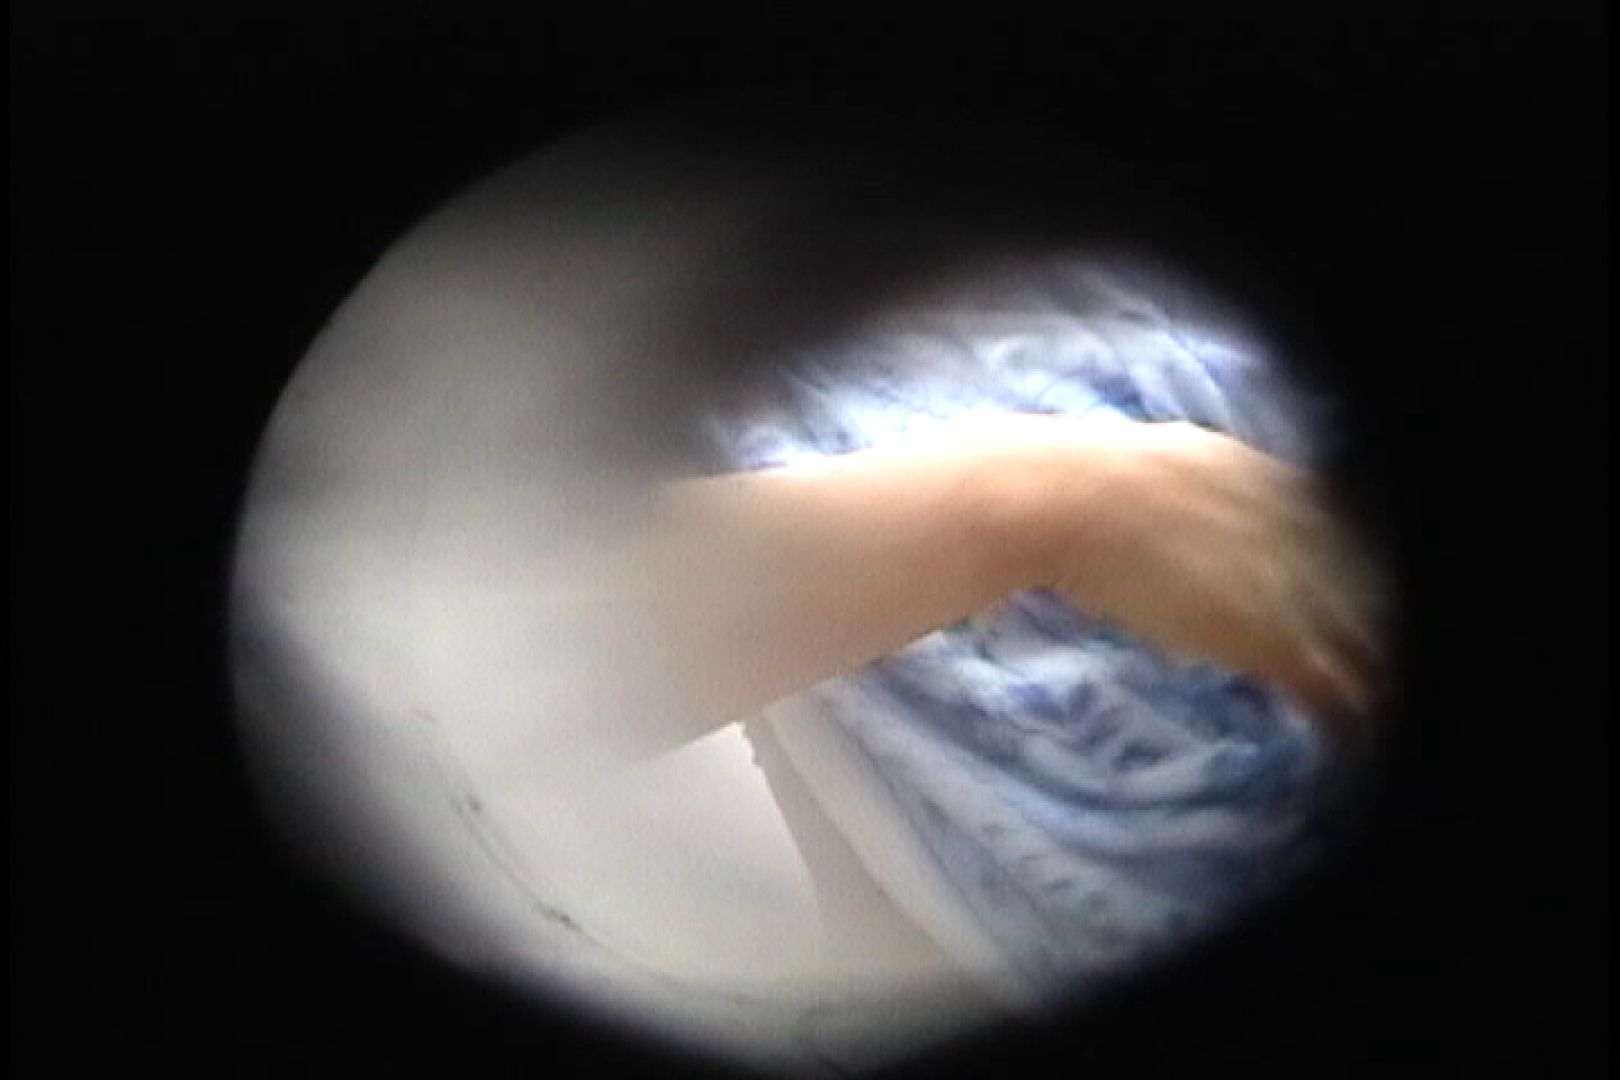 No.92 肉付きの良いマンコの真ん中に一本みち!! シャワー室 オメコ動画キャプチャ 49画像 29